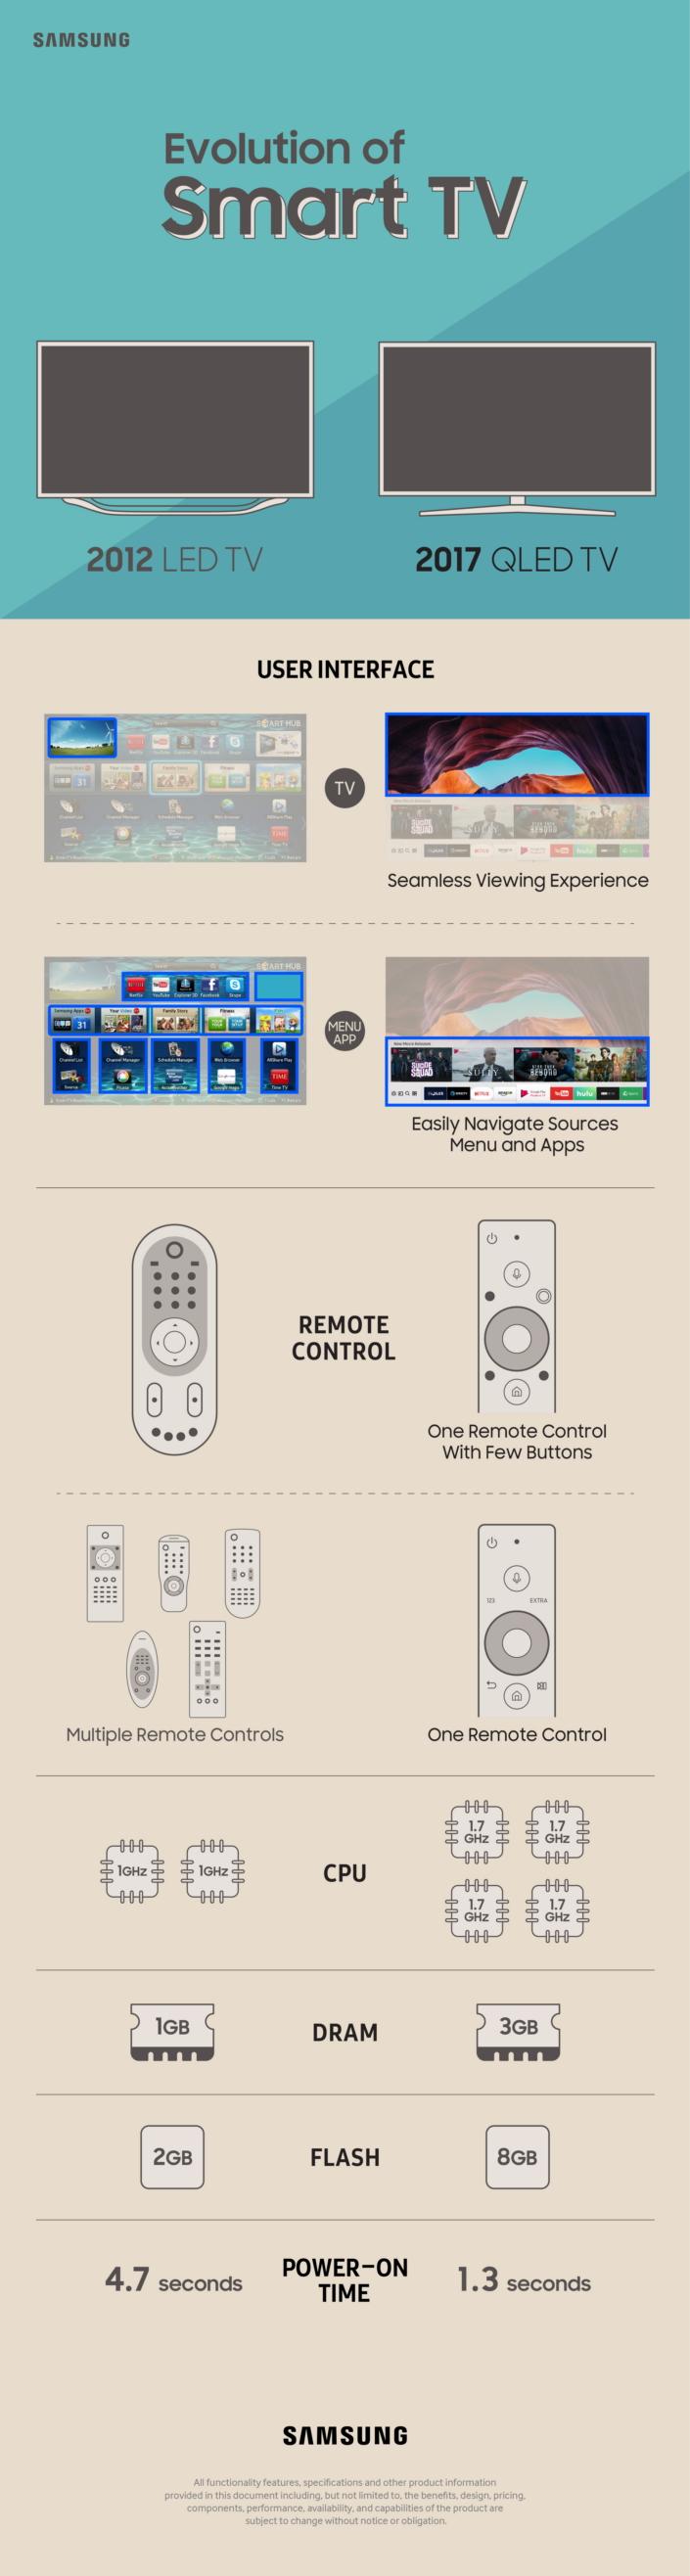 Эволюция Samsung Smart TV